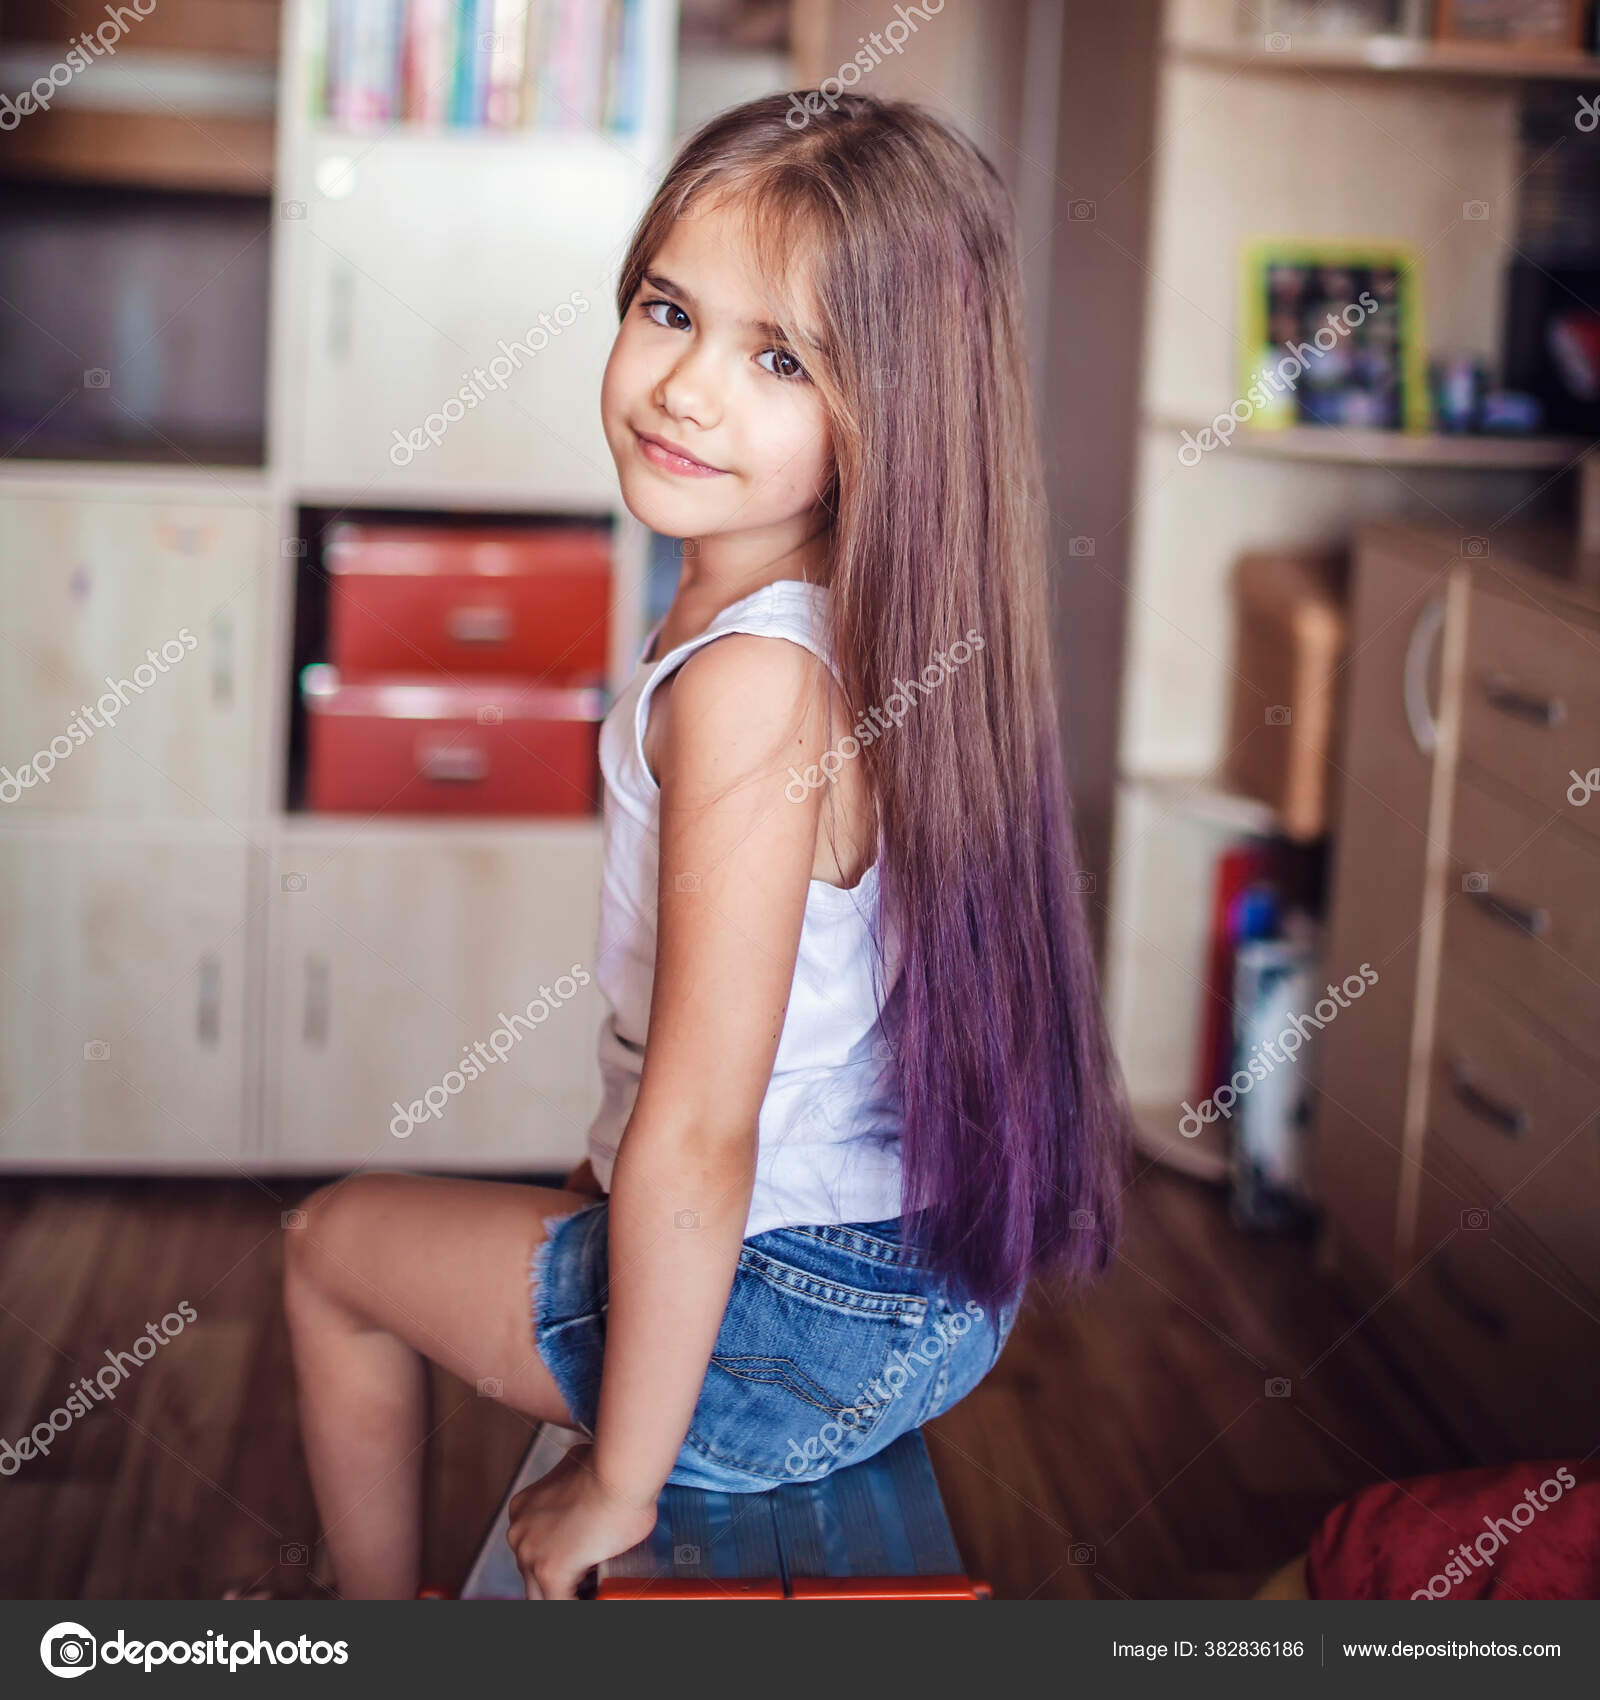 Beauty Salon Home First Hair Dye Experience Girl Power Cute Stock Photo C Maria Symchych 382836186